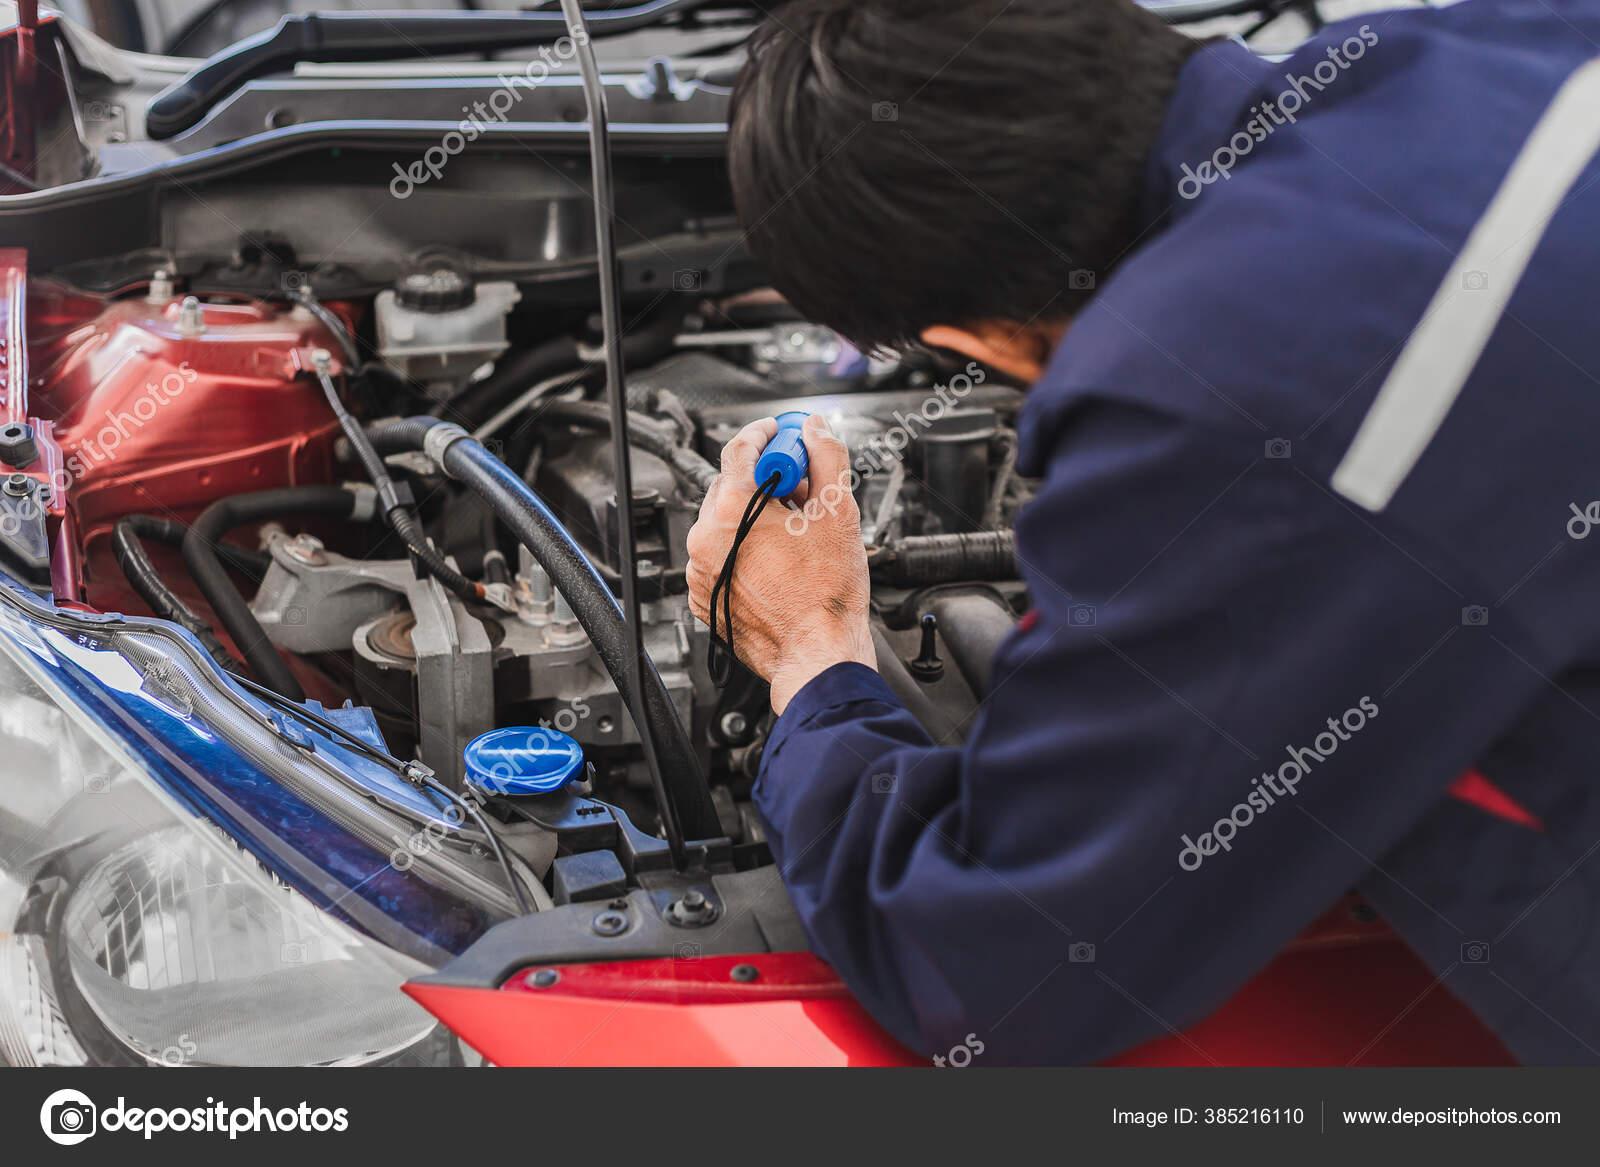 Asian Man Mechanic Inspection Shine Torch Car Engine Checking Bug Stock Photo C Oatstocker 385216110